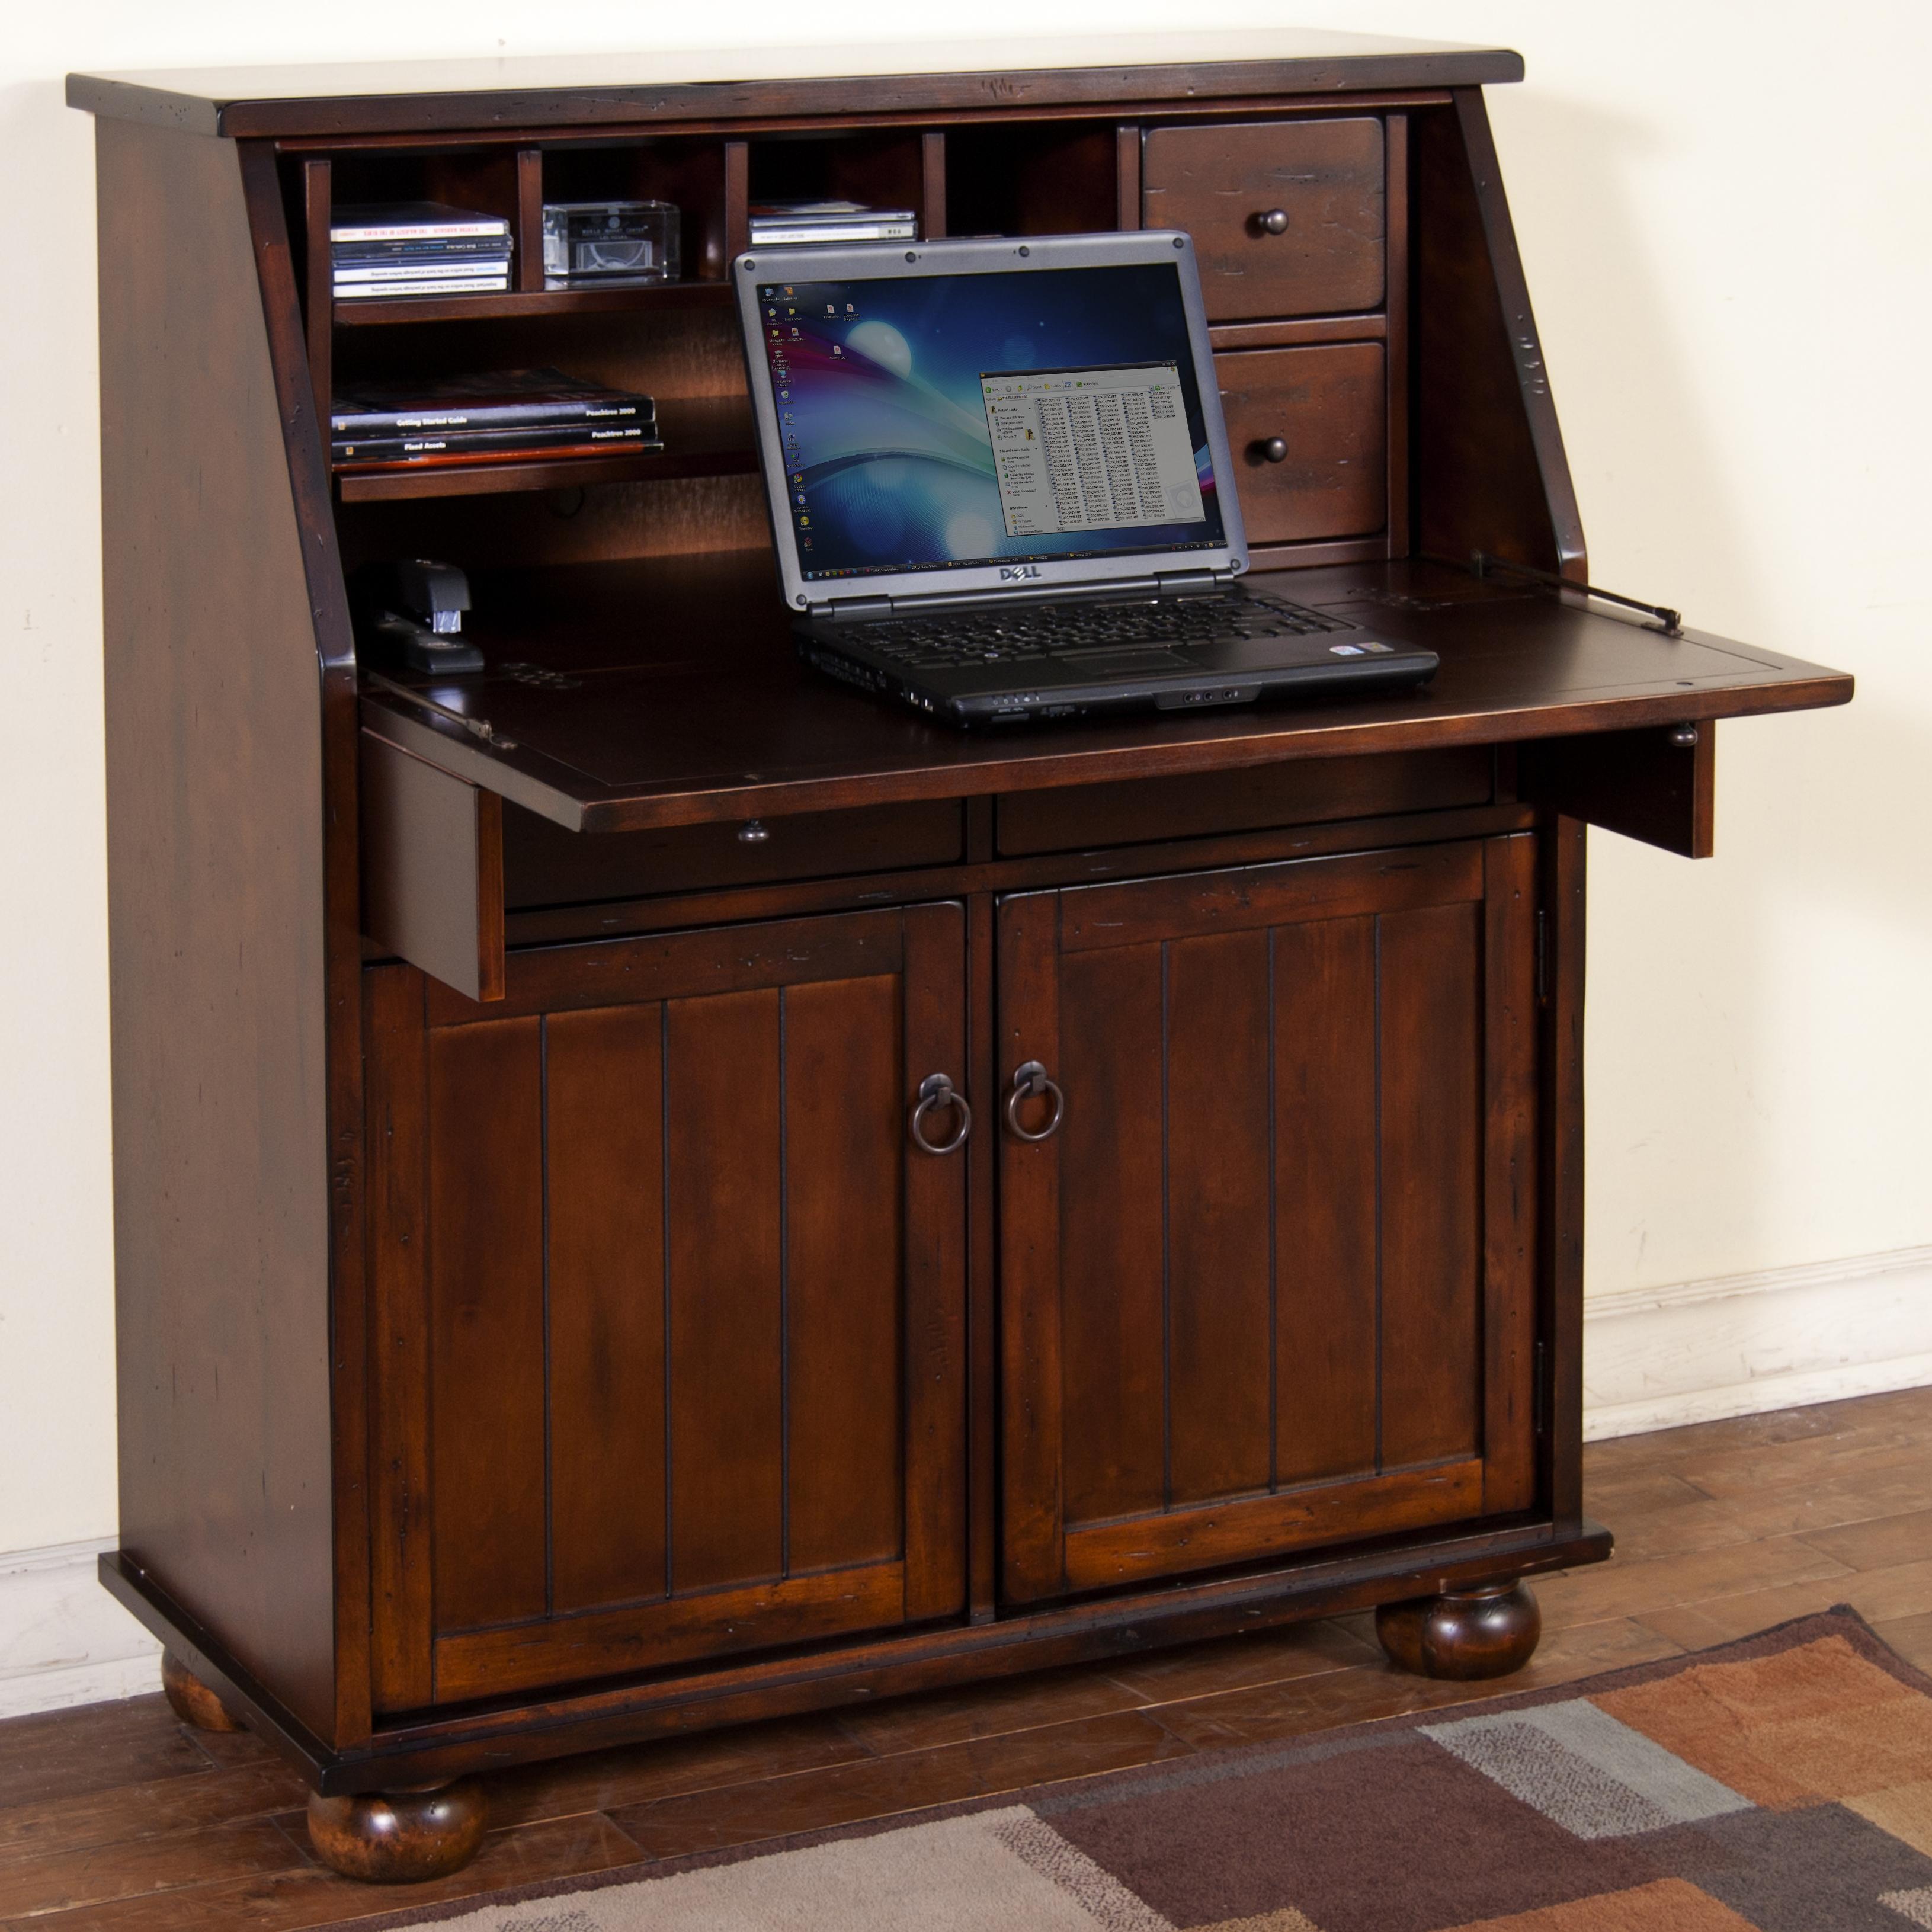 Santa Fe Drop Leaf Laptop Desk Armoire  by Sunny Designs at Walker's Furniture